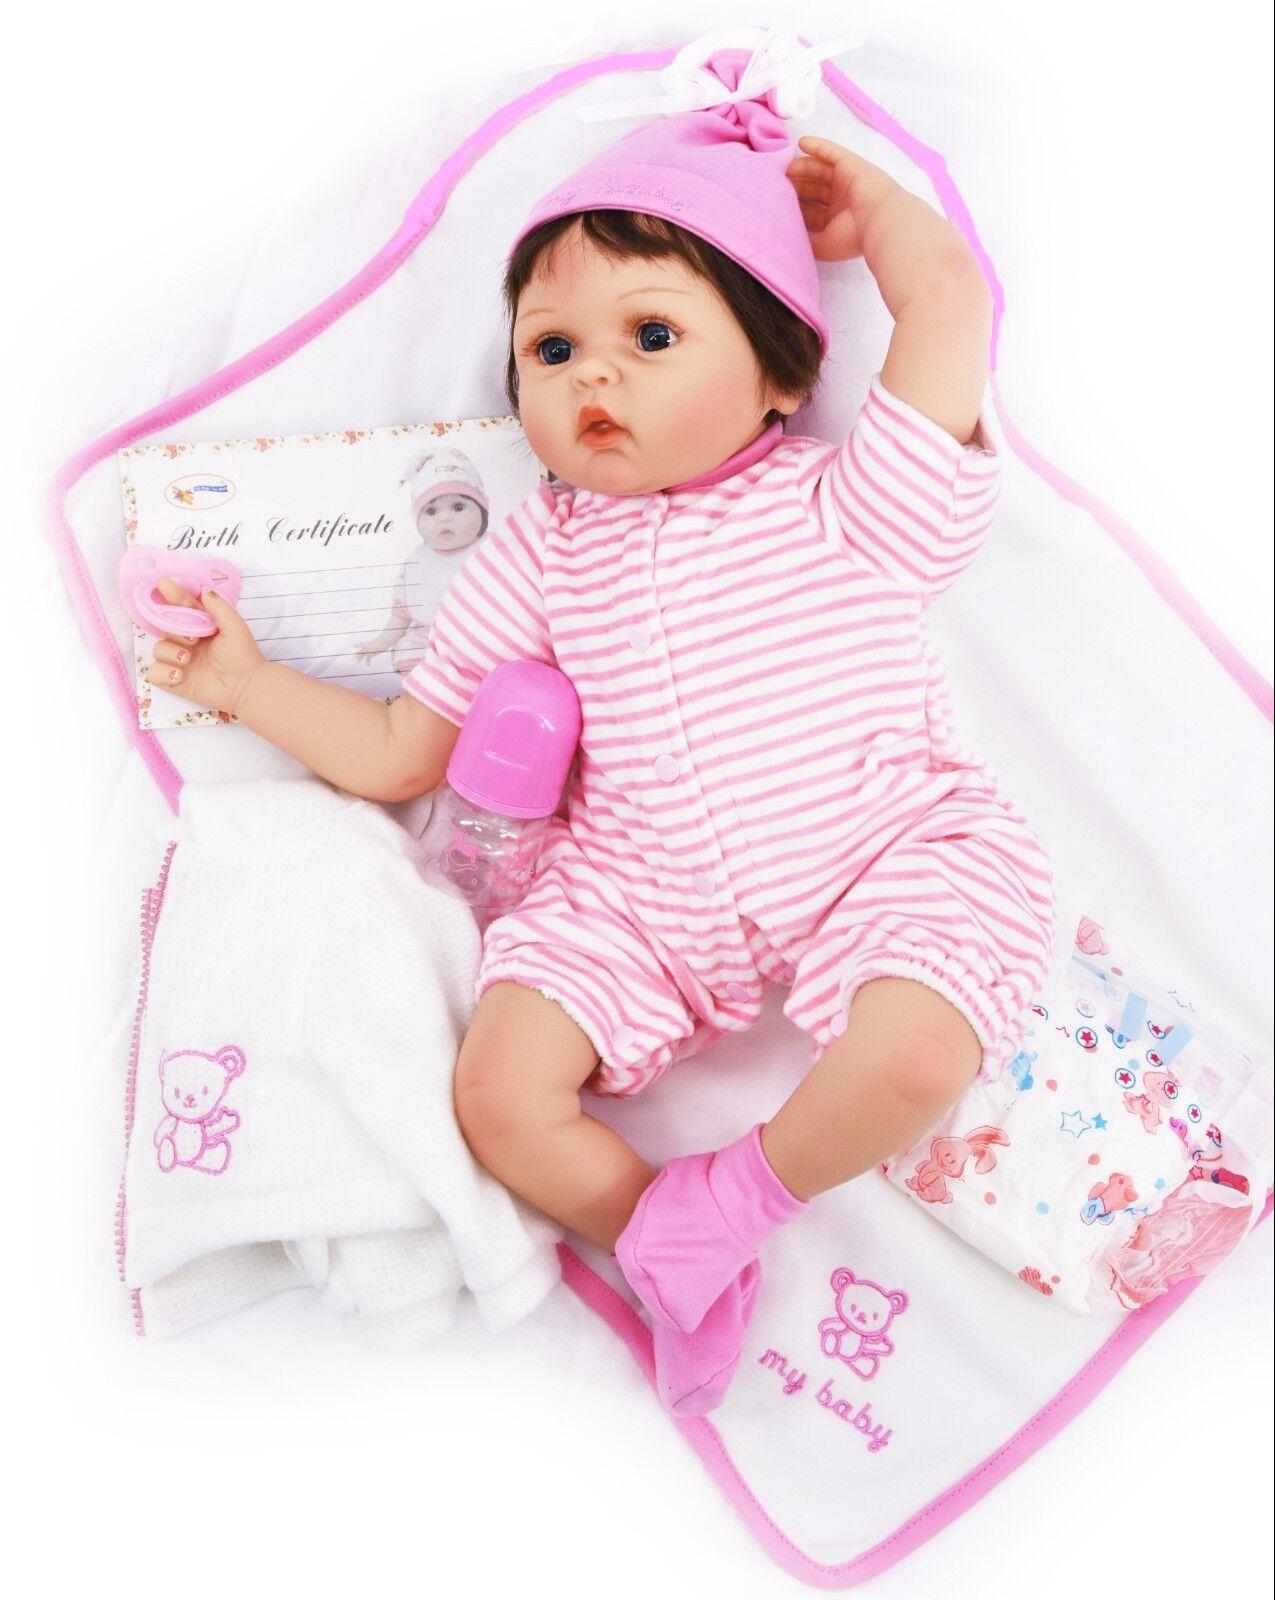 22  Reborn Baby Girl Handmade Lifelike Realistic Doll Dummy Blanket Gift Box